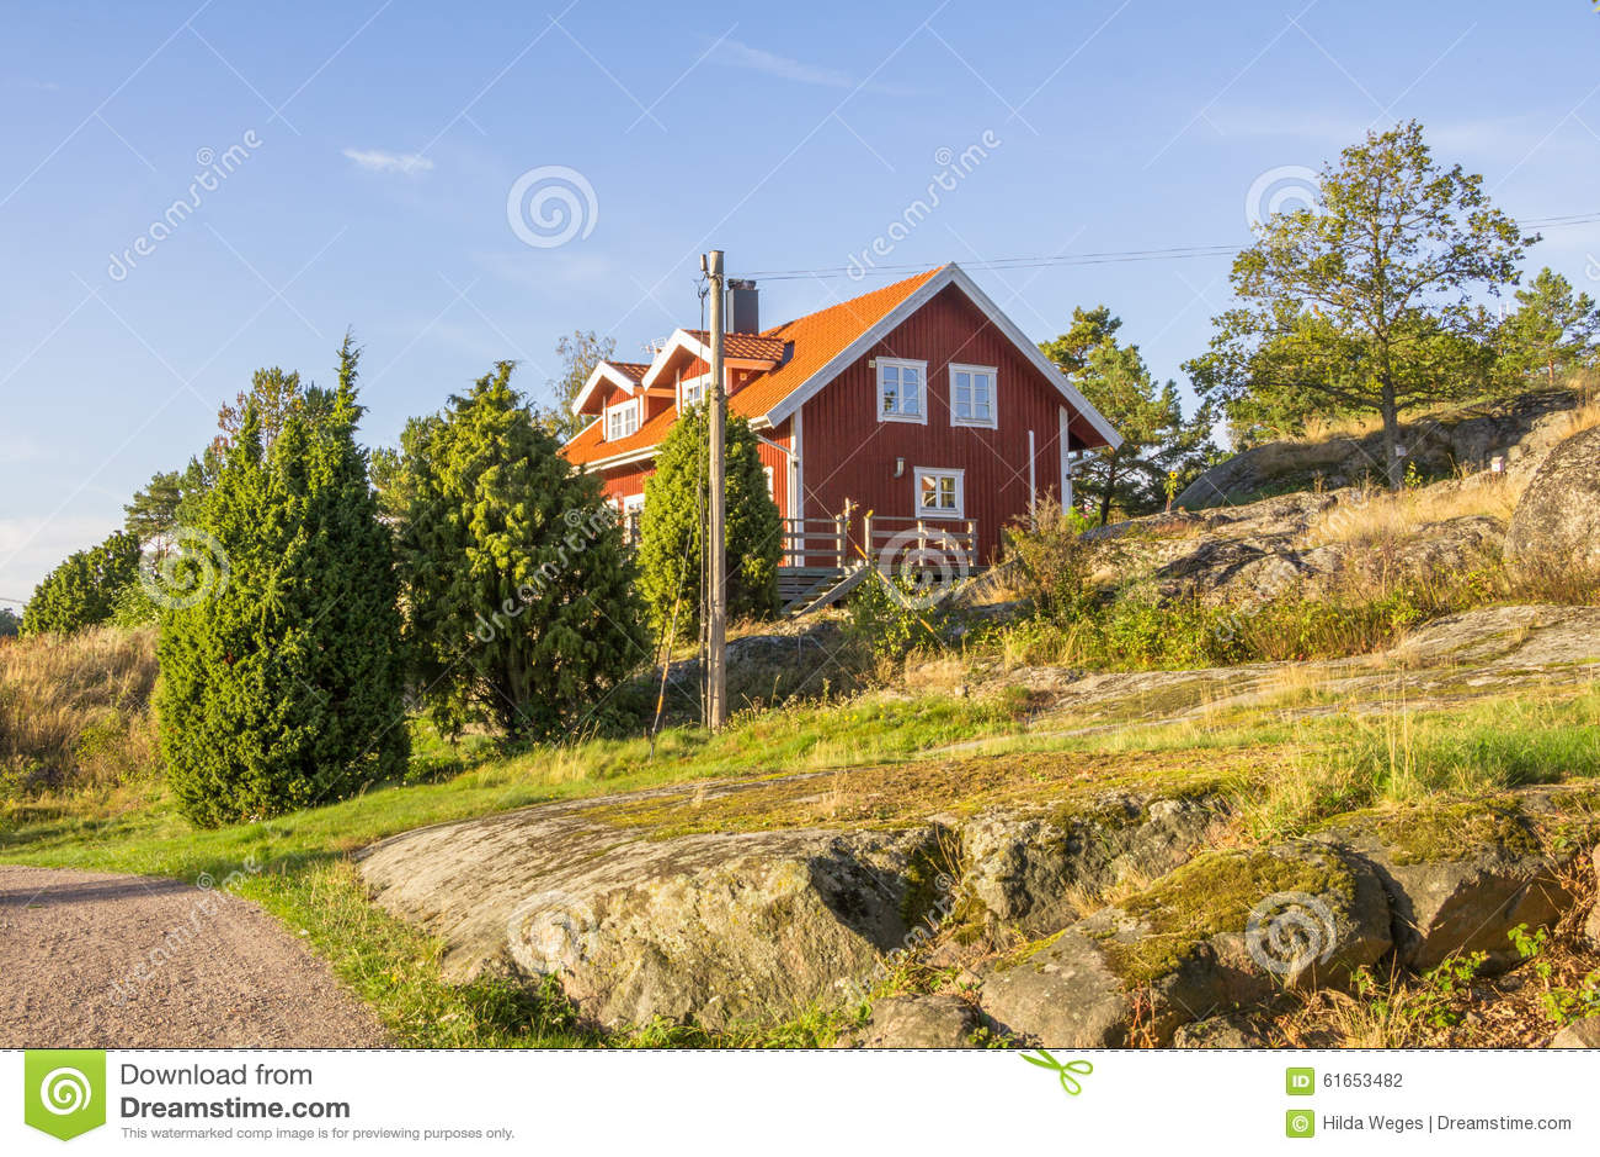 Island Harstena in Sweden